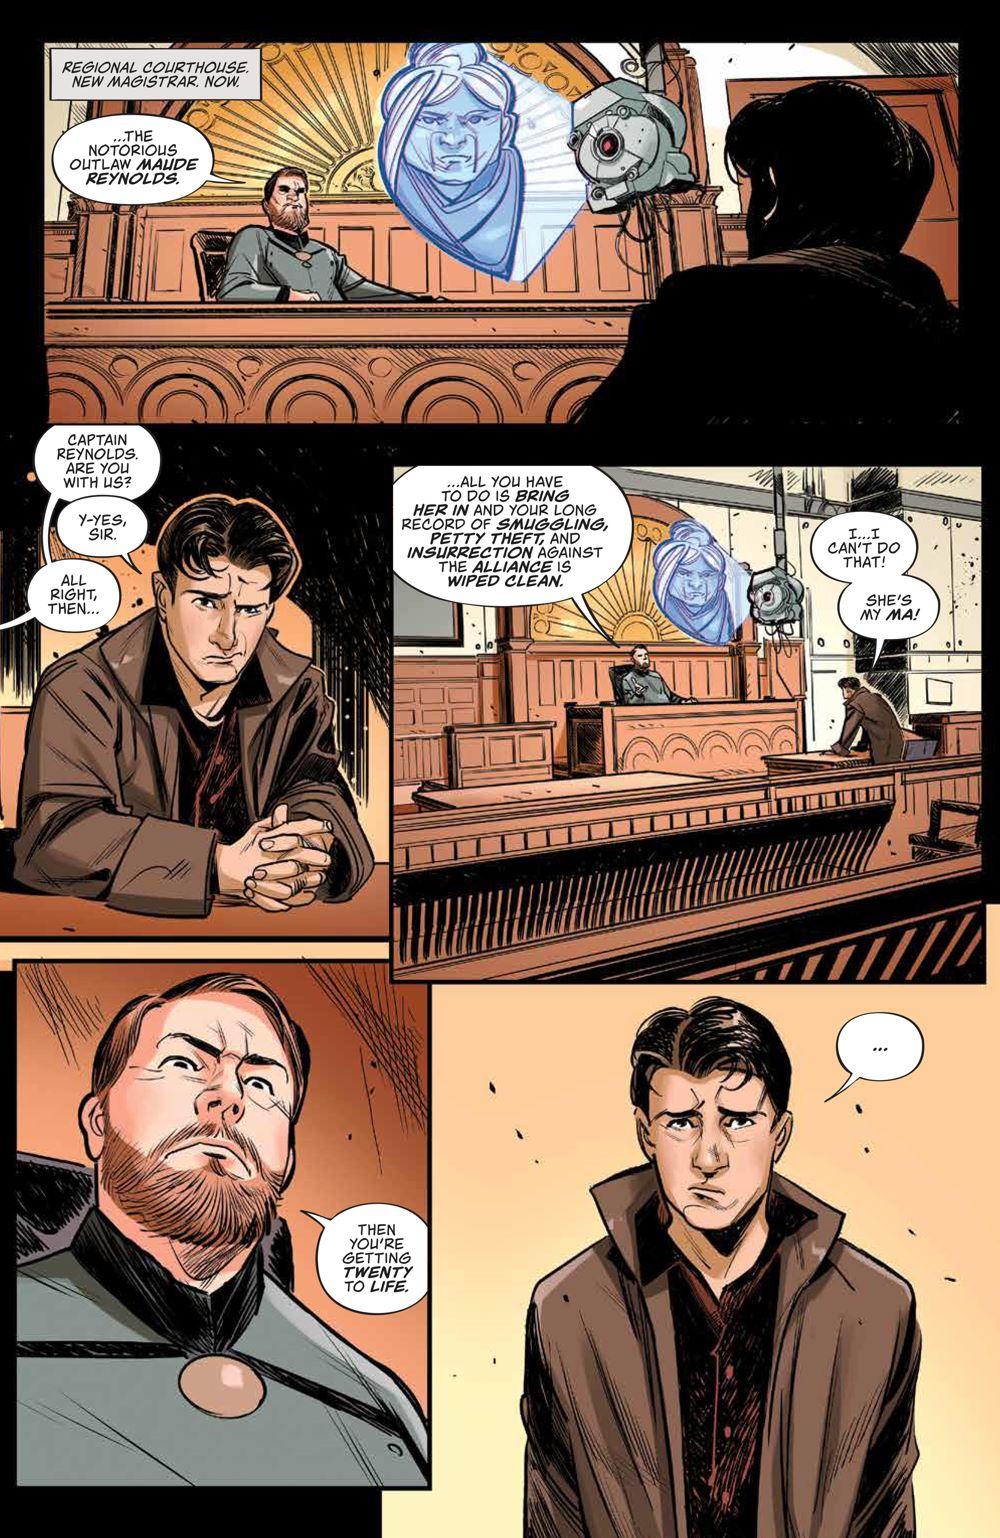 Firefly_NewSheriffVerse_v1_HC_PRESS_13 ComicList Previews: FIREFLY NEW SHERIFF IN THE 'VERSE VOLUME 1 HC